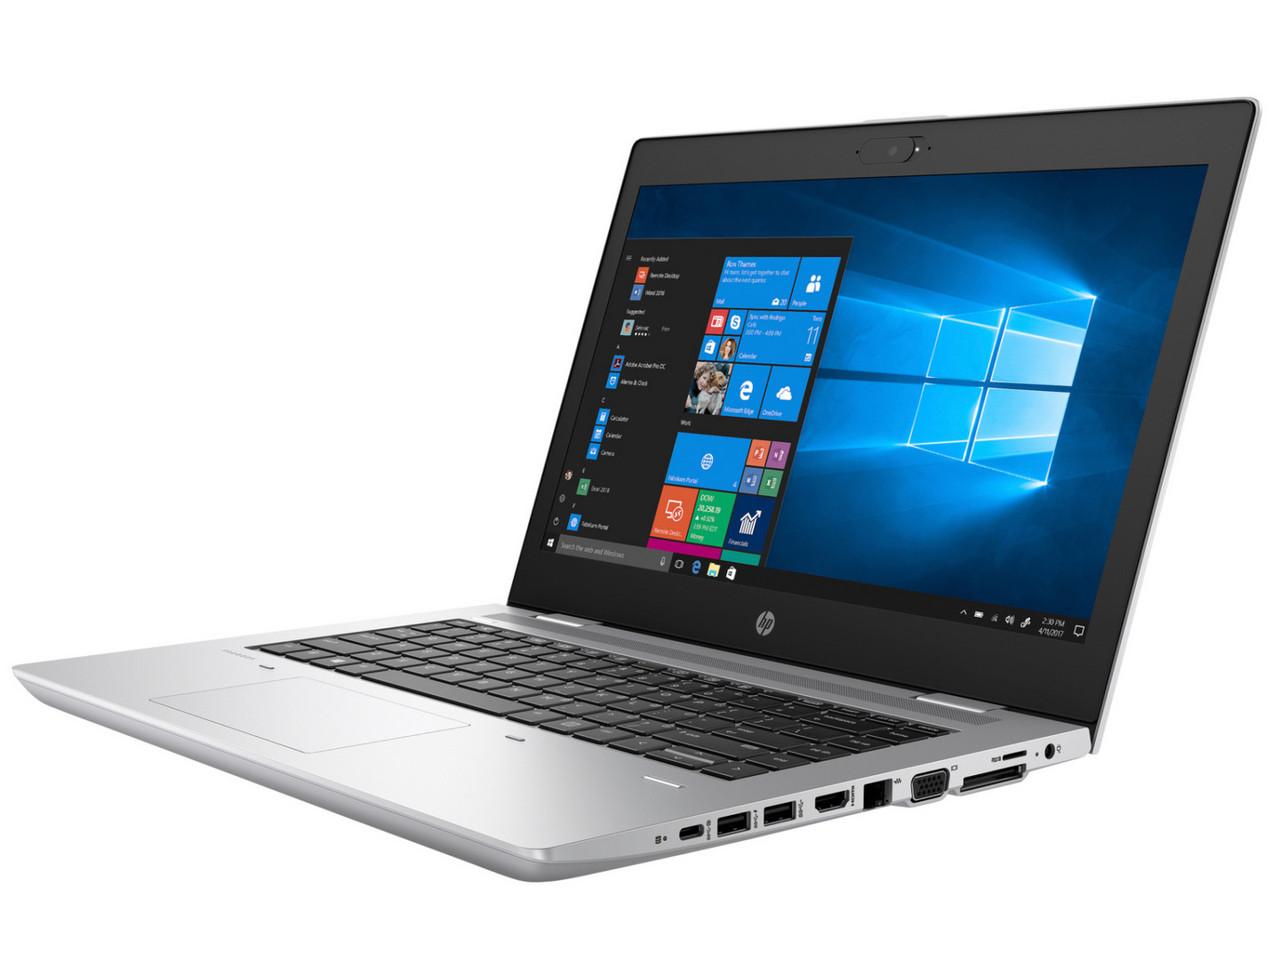 "HP ProBook 640 G4 Business Laptop 14"" FHD i7-8650U 16GB 512GB SSD Cam FPR Wrty"